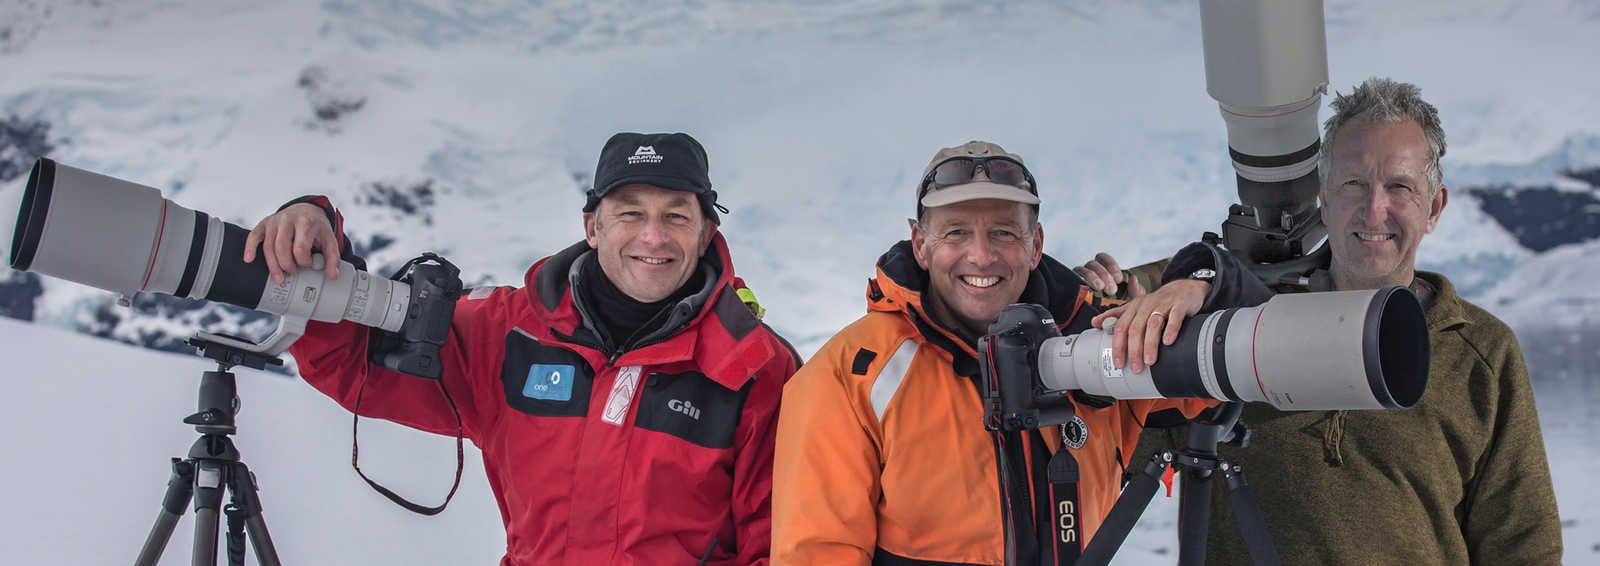 Polar PhotogrpahyTrip